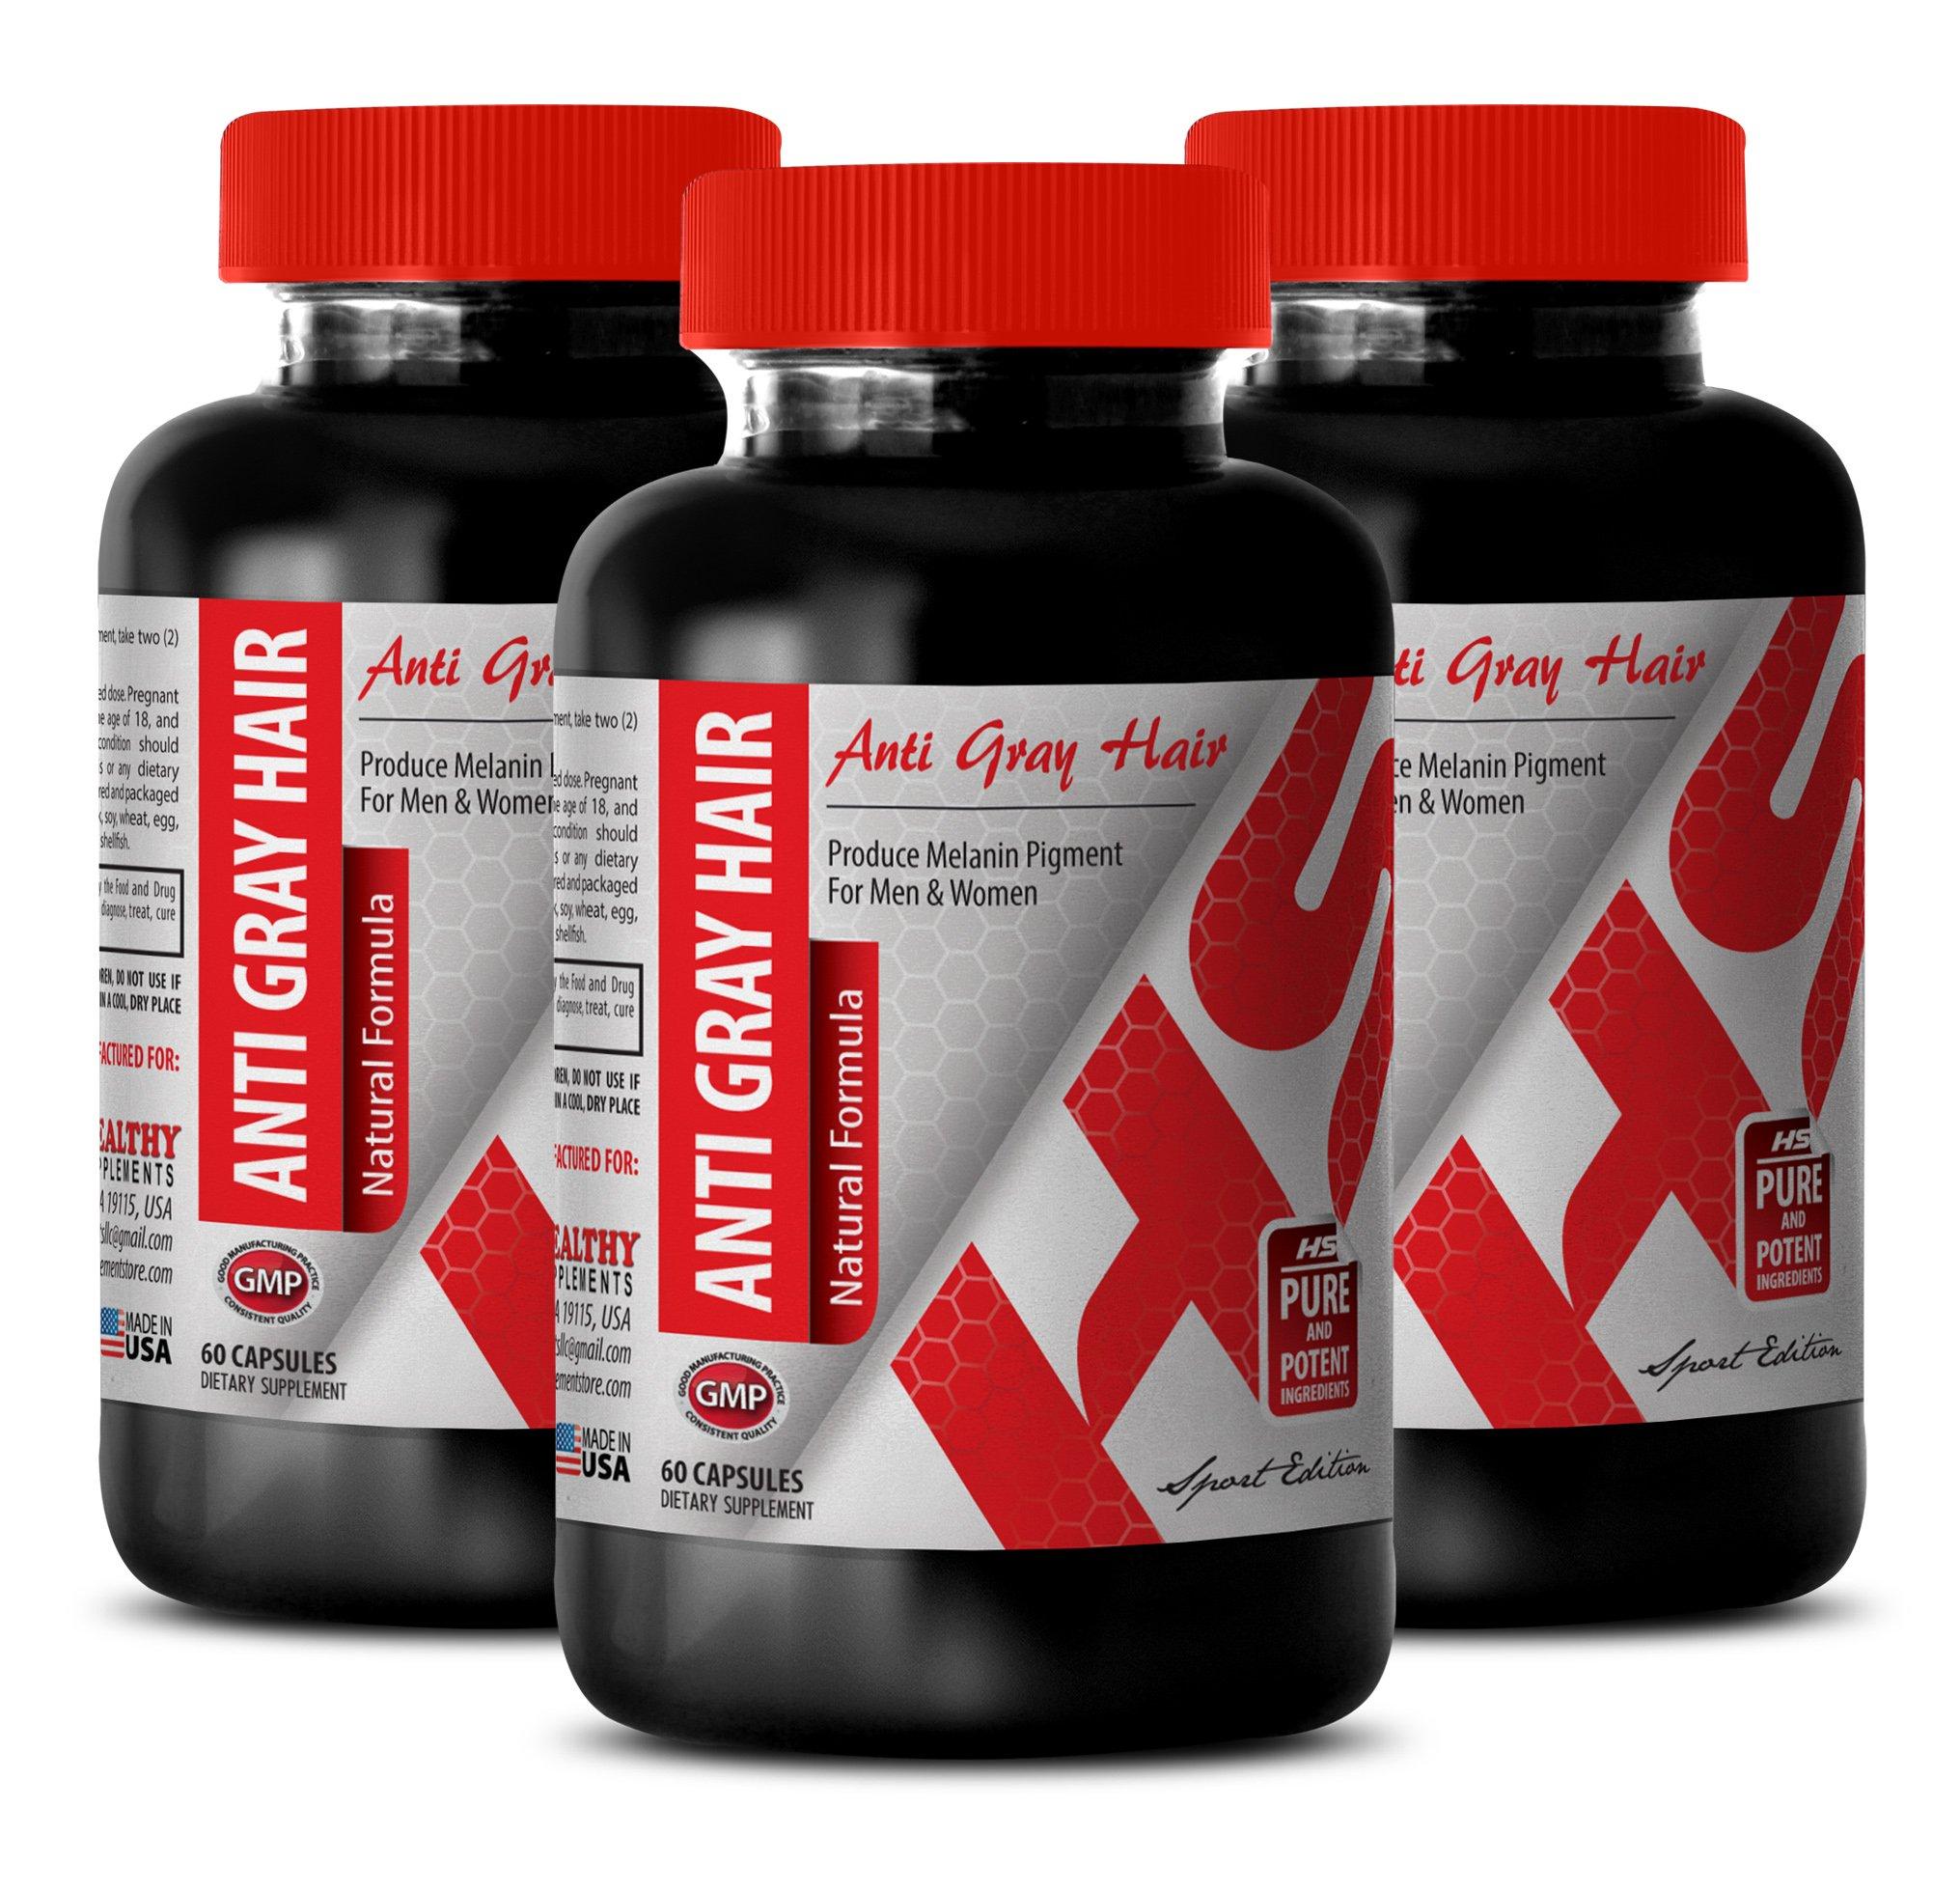 rejuvenation supplement - ANTI-GRAY HAIR 1200MG - NATURAL FORMULA - nettle leaf capsules - 3 Bottles (180 Capsules)